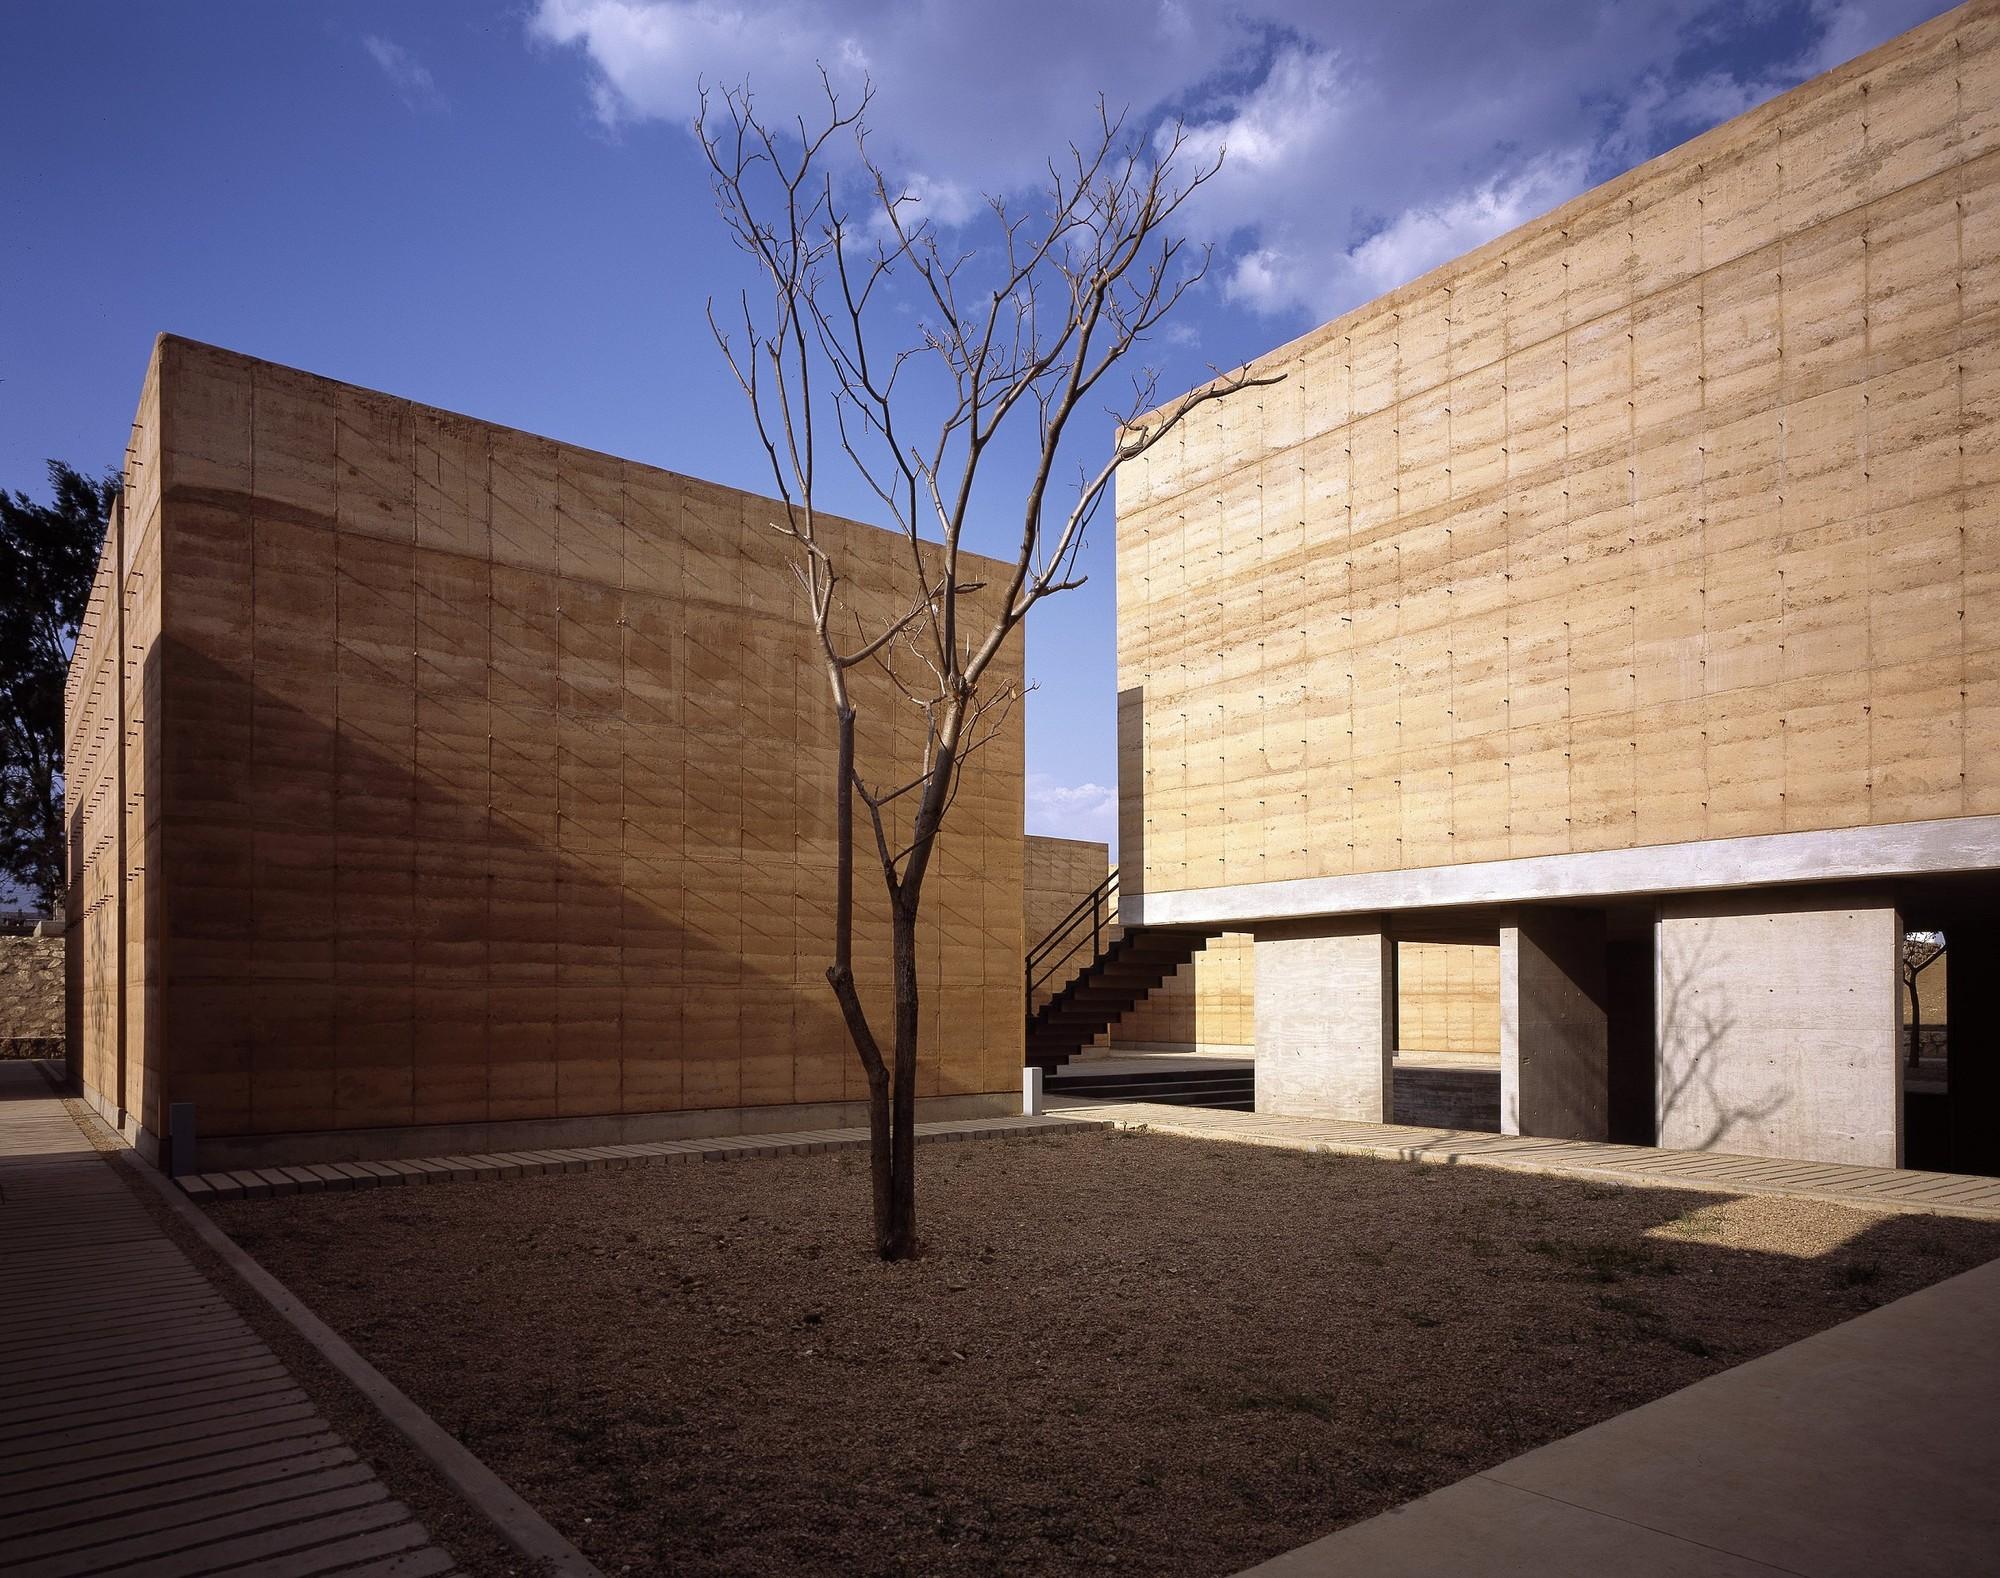 México | Proyecto Escuela Artes Plásticas | Mauricio Rocha . Image